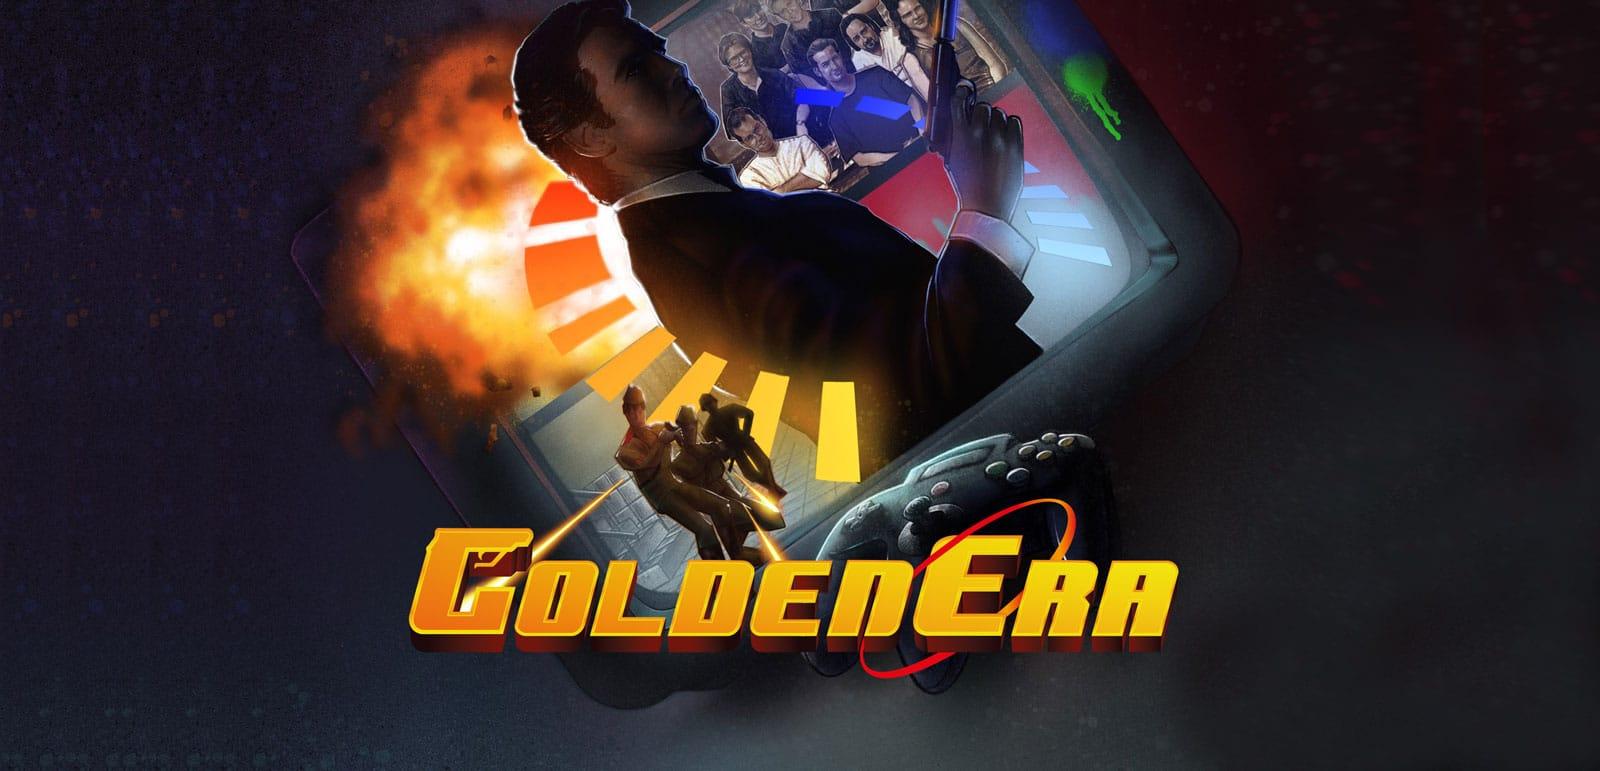 GoldenEra - Coming Soon